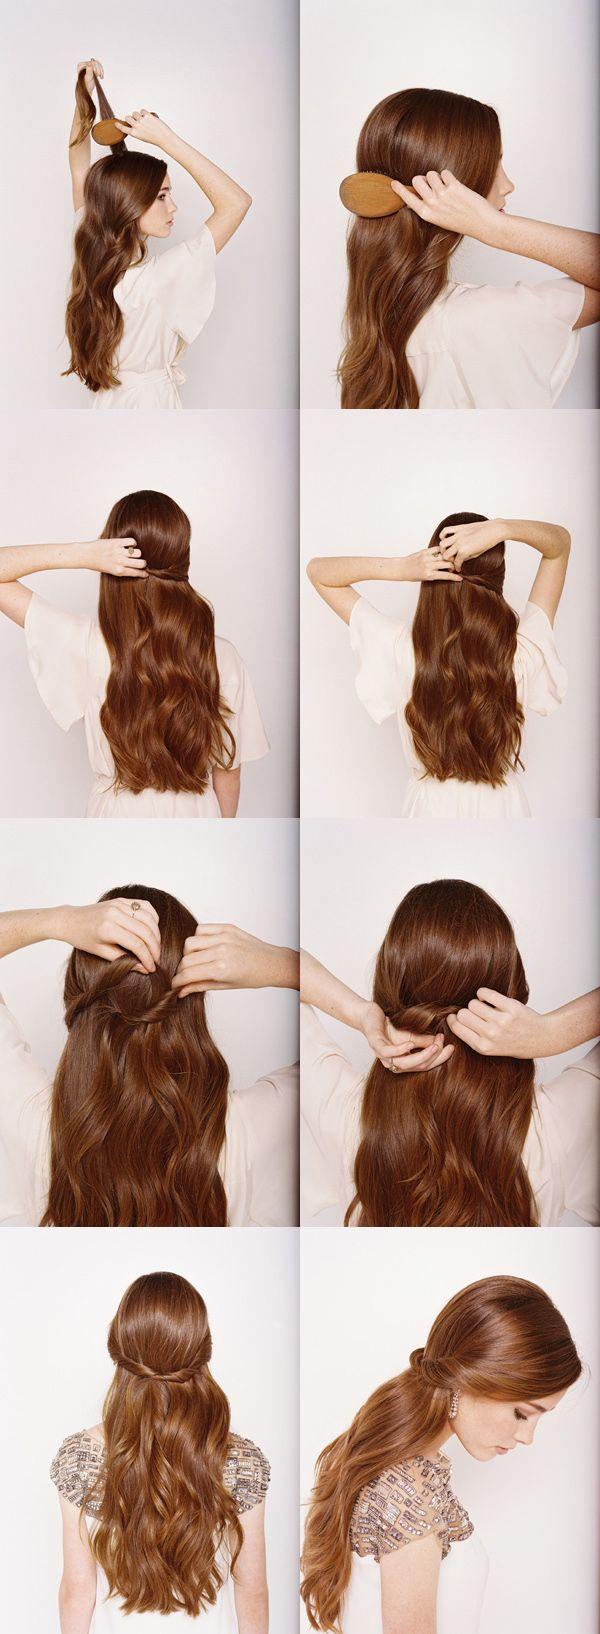 Pin by alondra martinez on hair pinterest hair make up hair